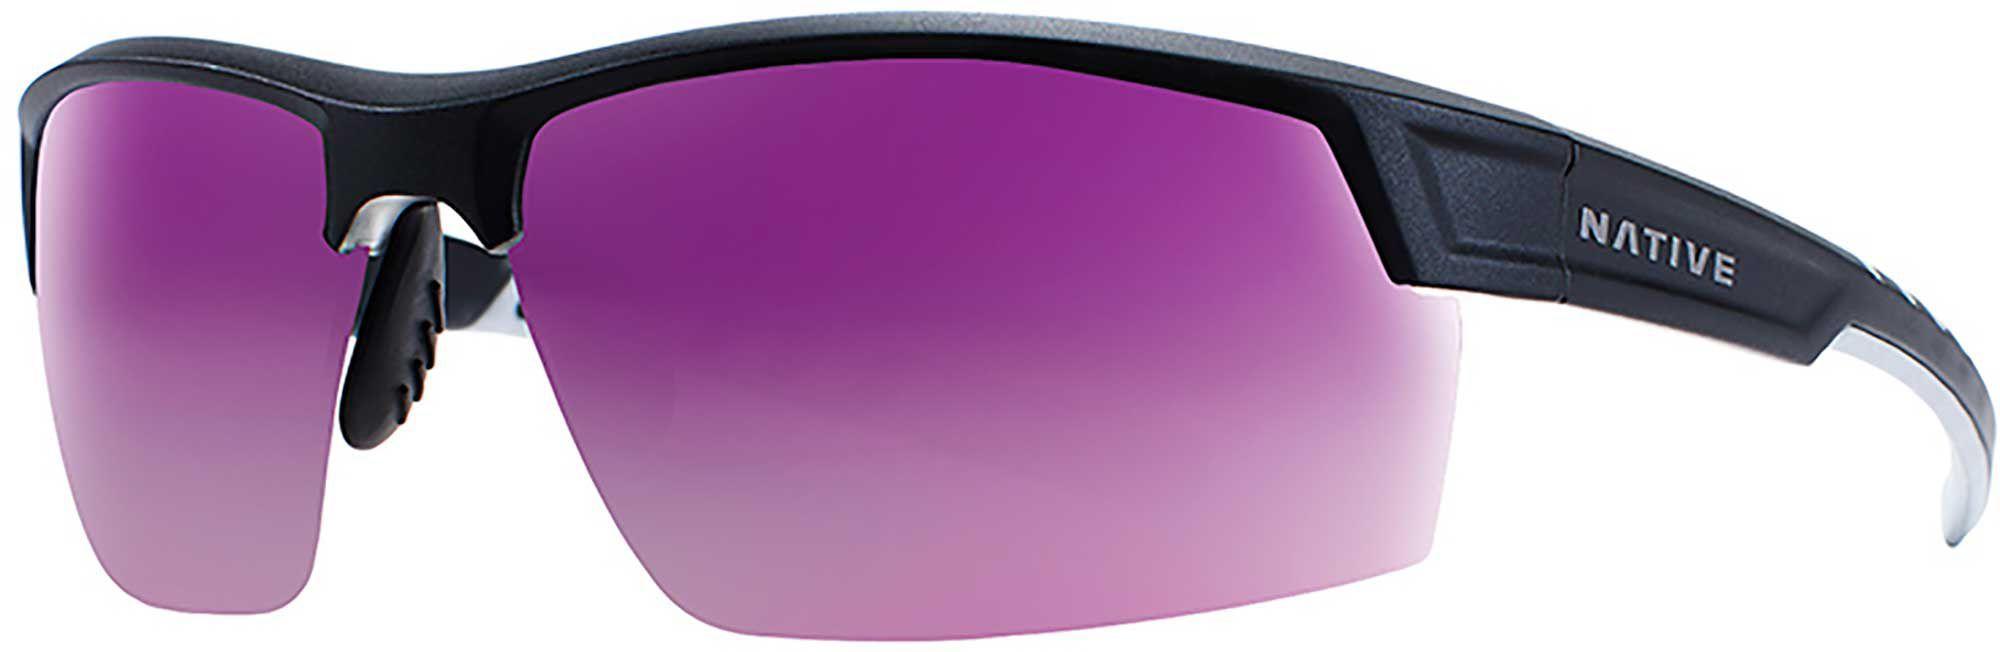 04ed74b689 Lyst - Native Eyewear Catamount Sunglasses in Black